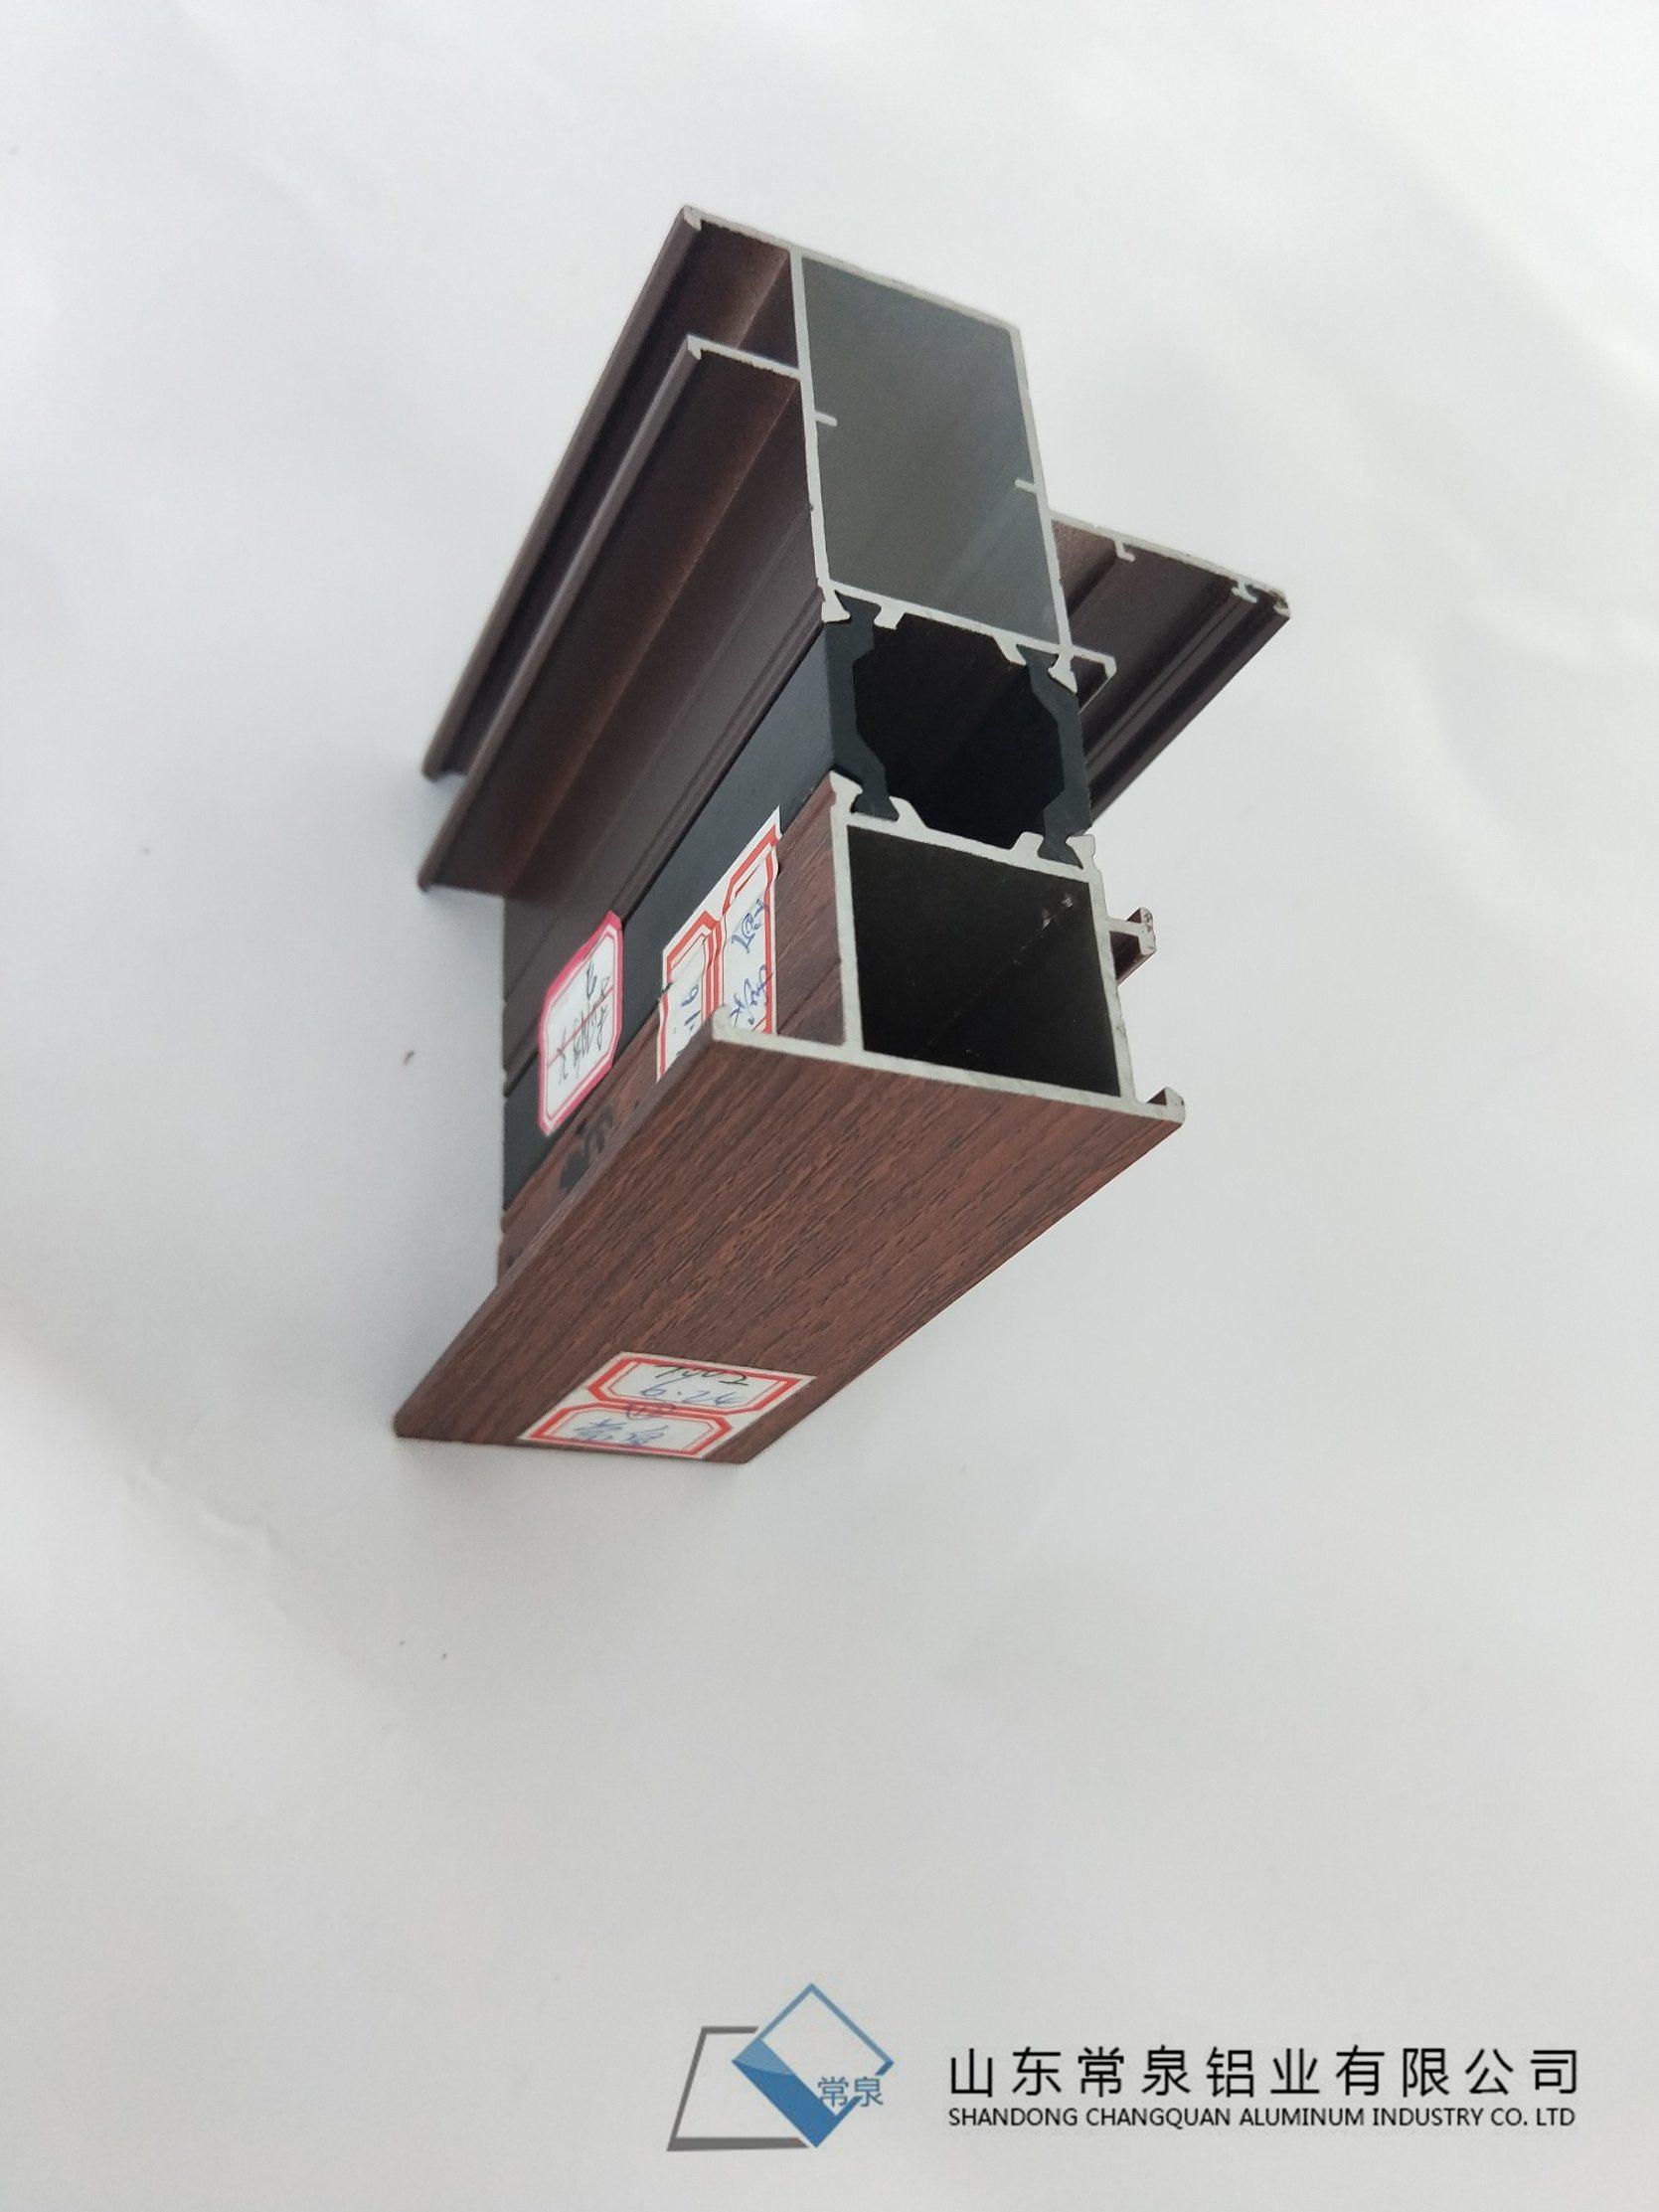 [Hot Item] Aluminium Extrusion 20X60 Alu Extrusion T Slot for CNC Building  Open Source